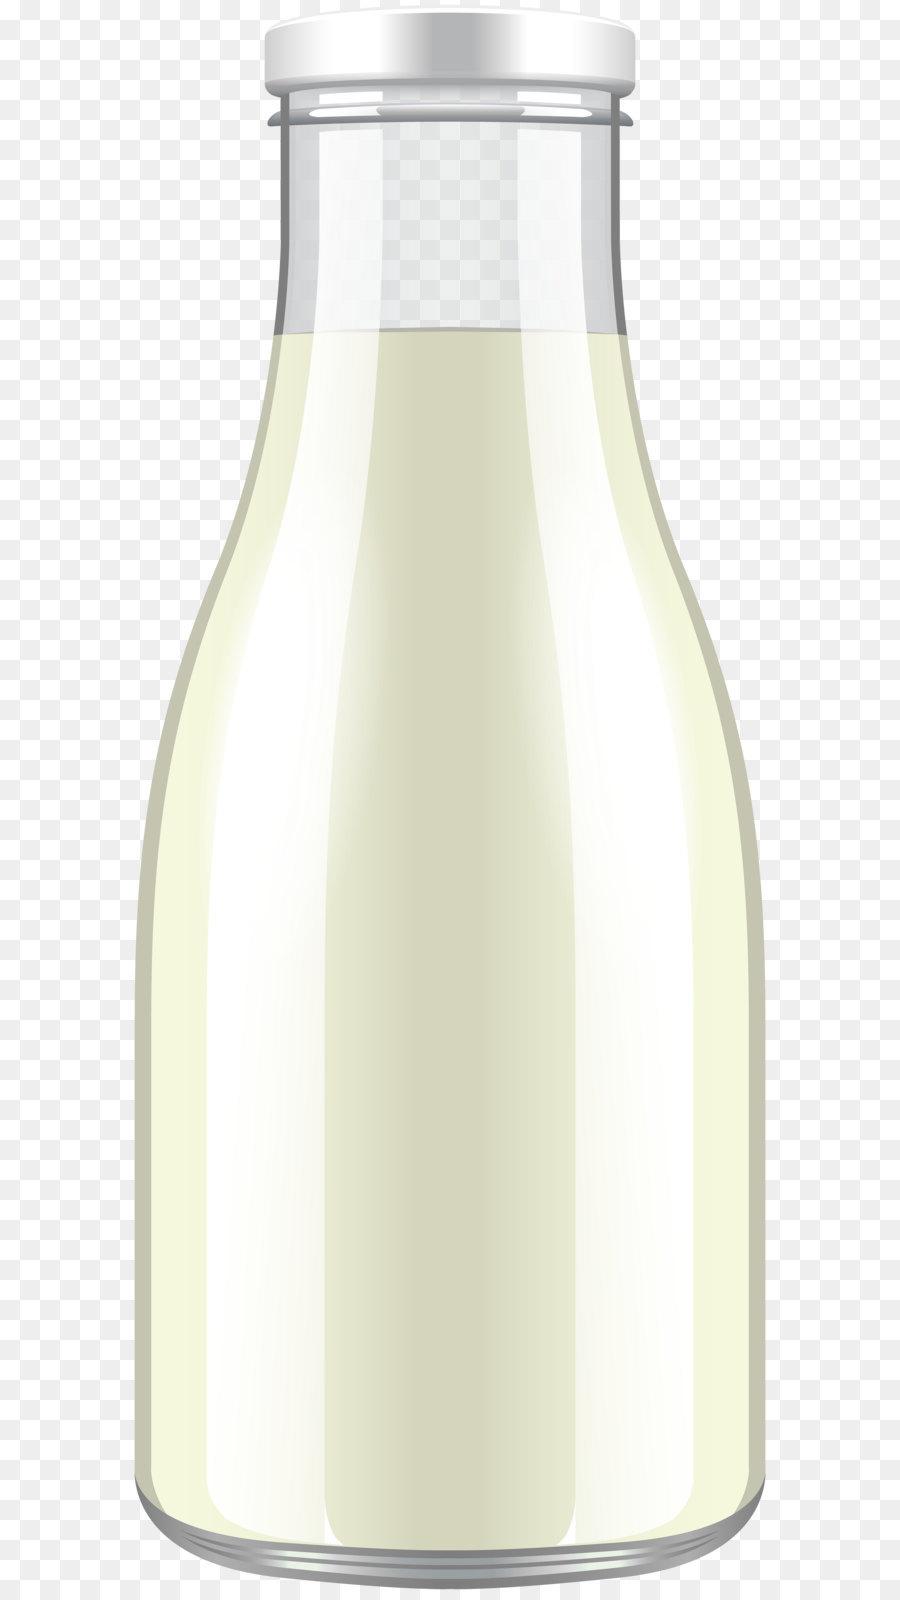 Христово, бутылка с молоком картинка